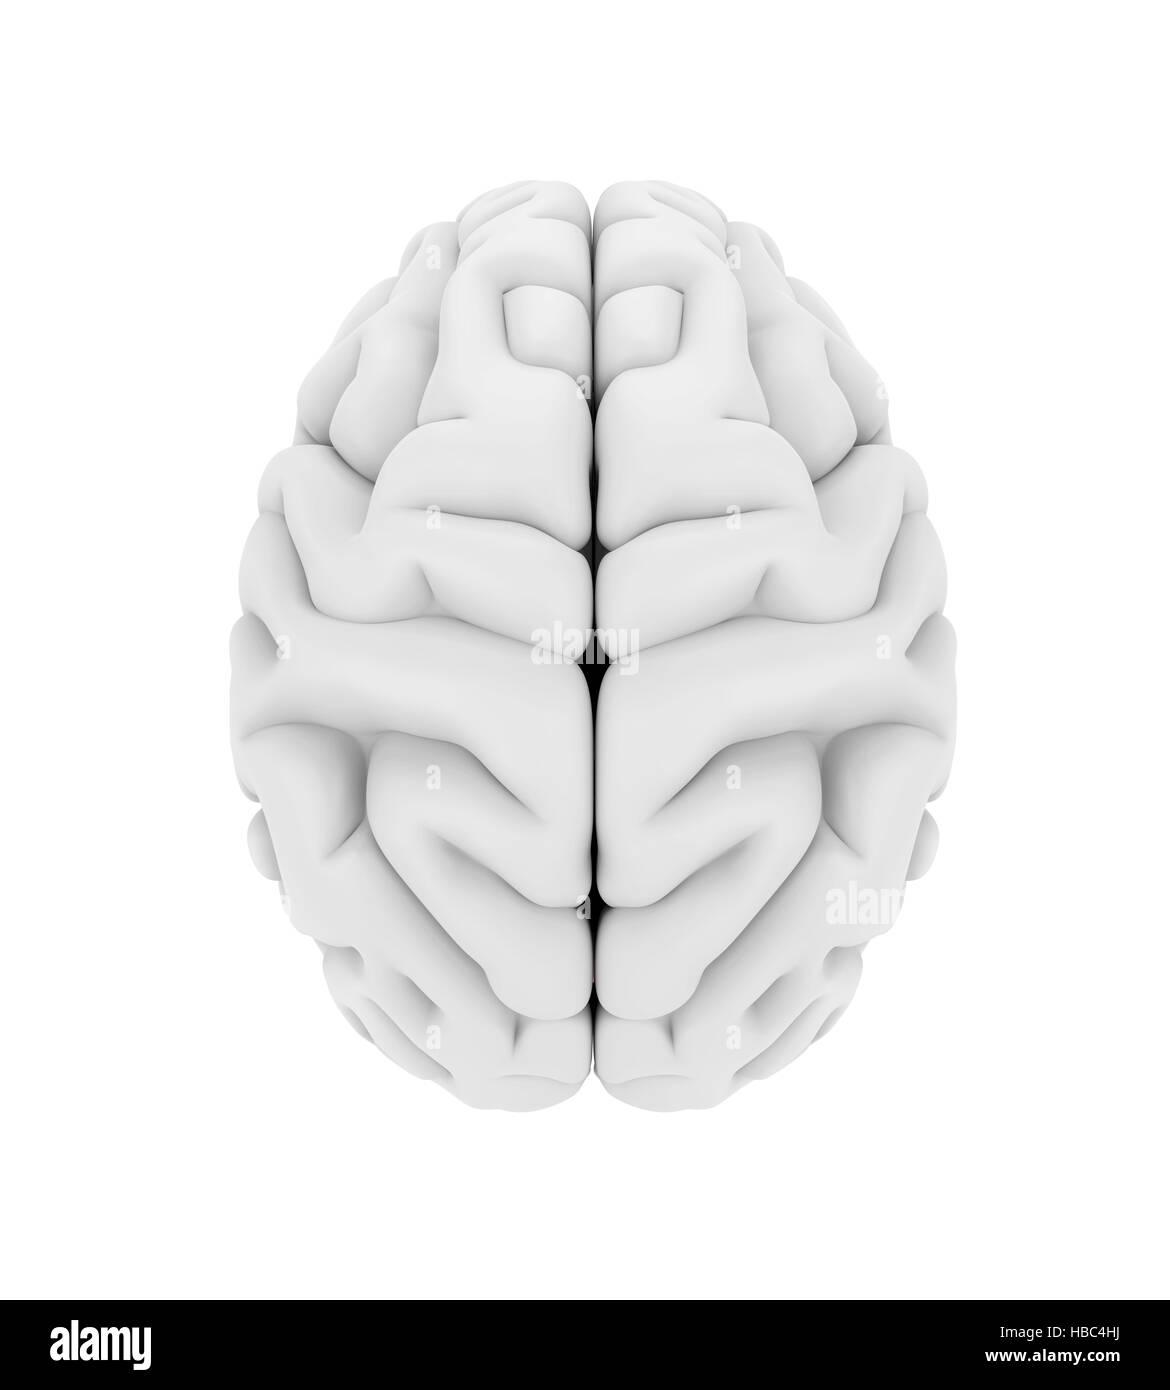 Left Right Human Brain Stockfotos & Left Right Human Brain Bilder ...